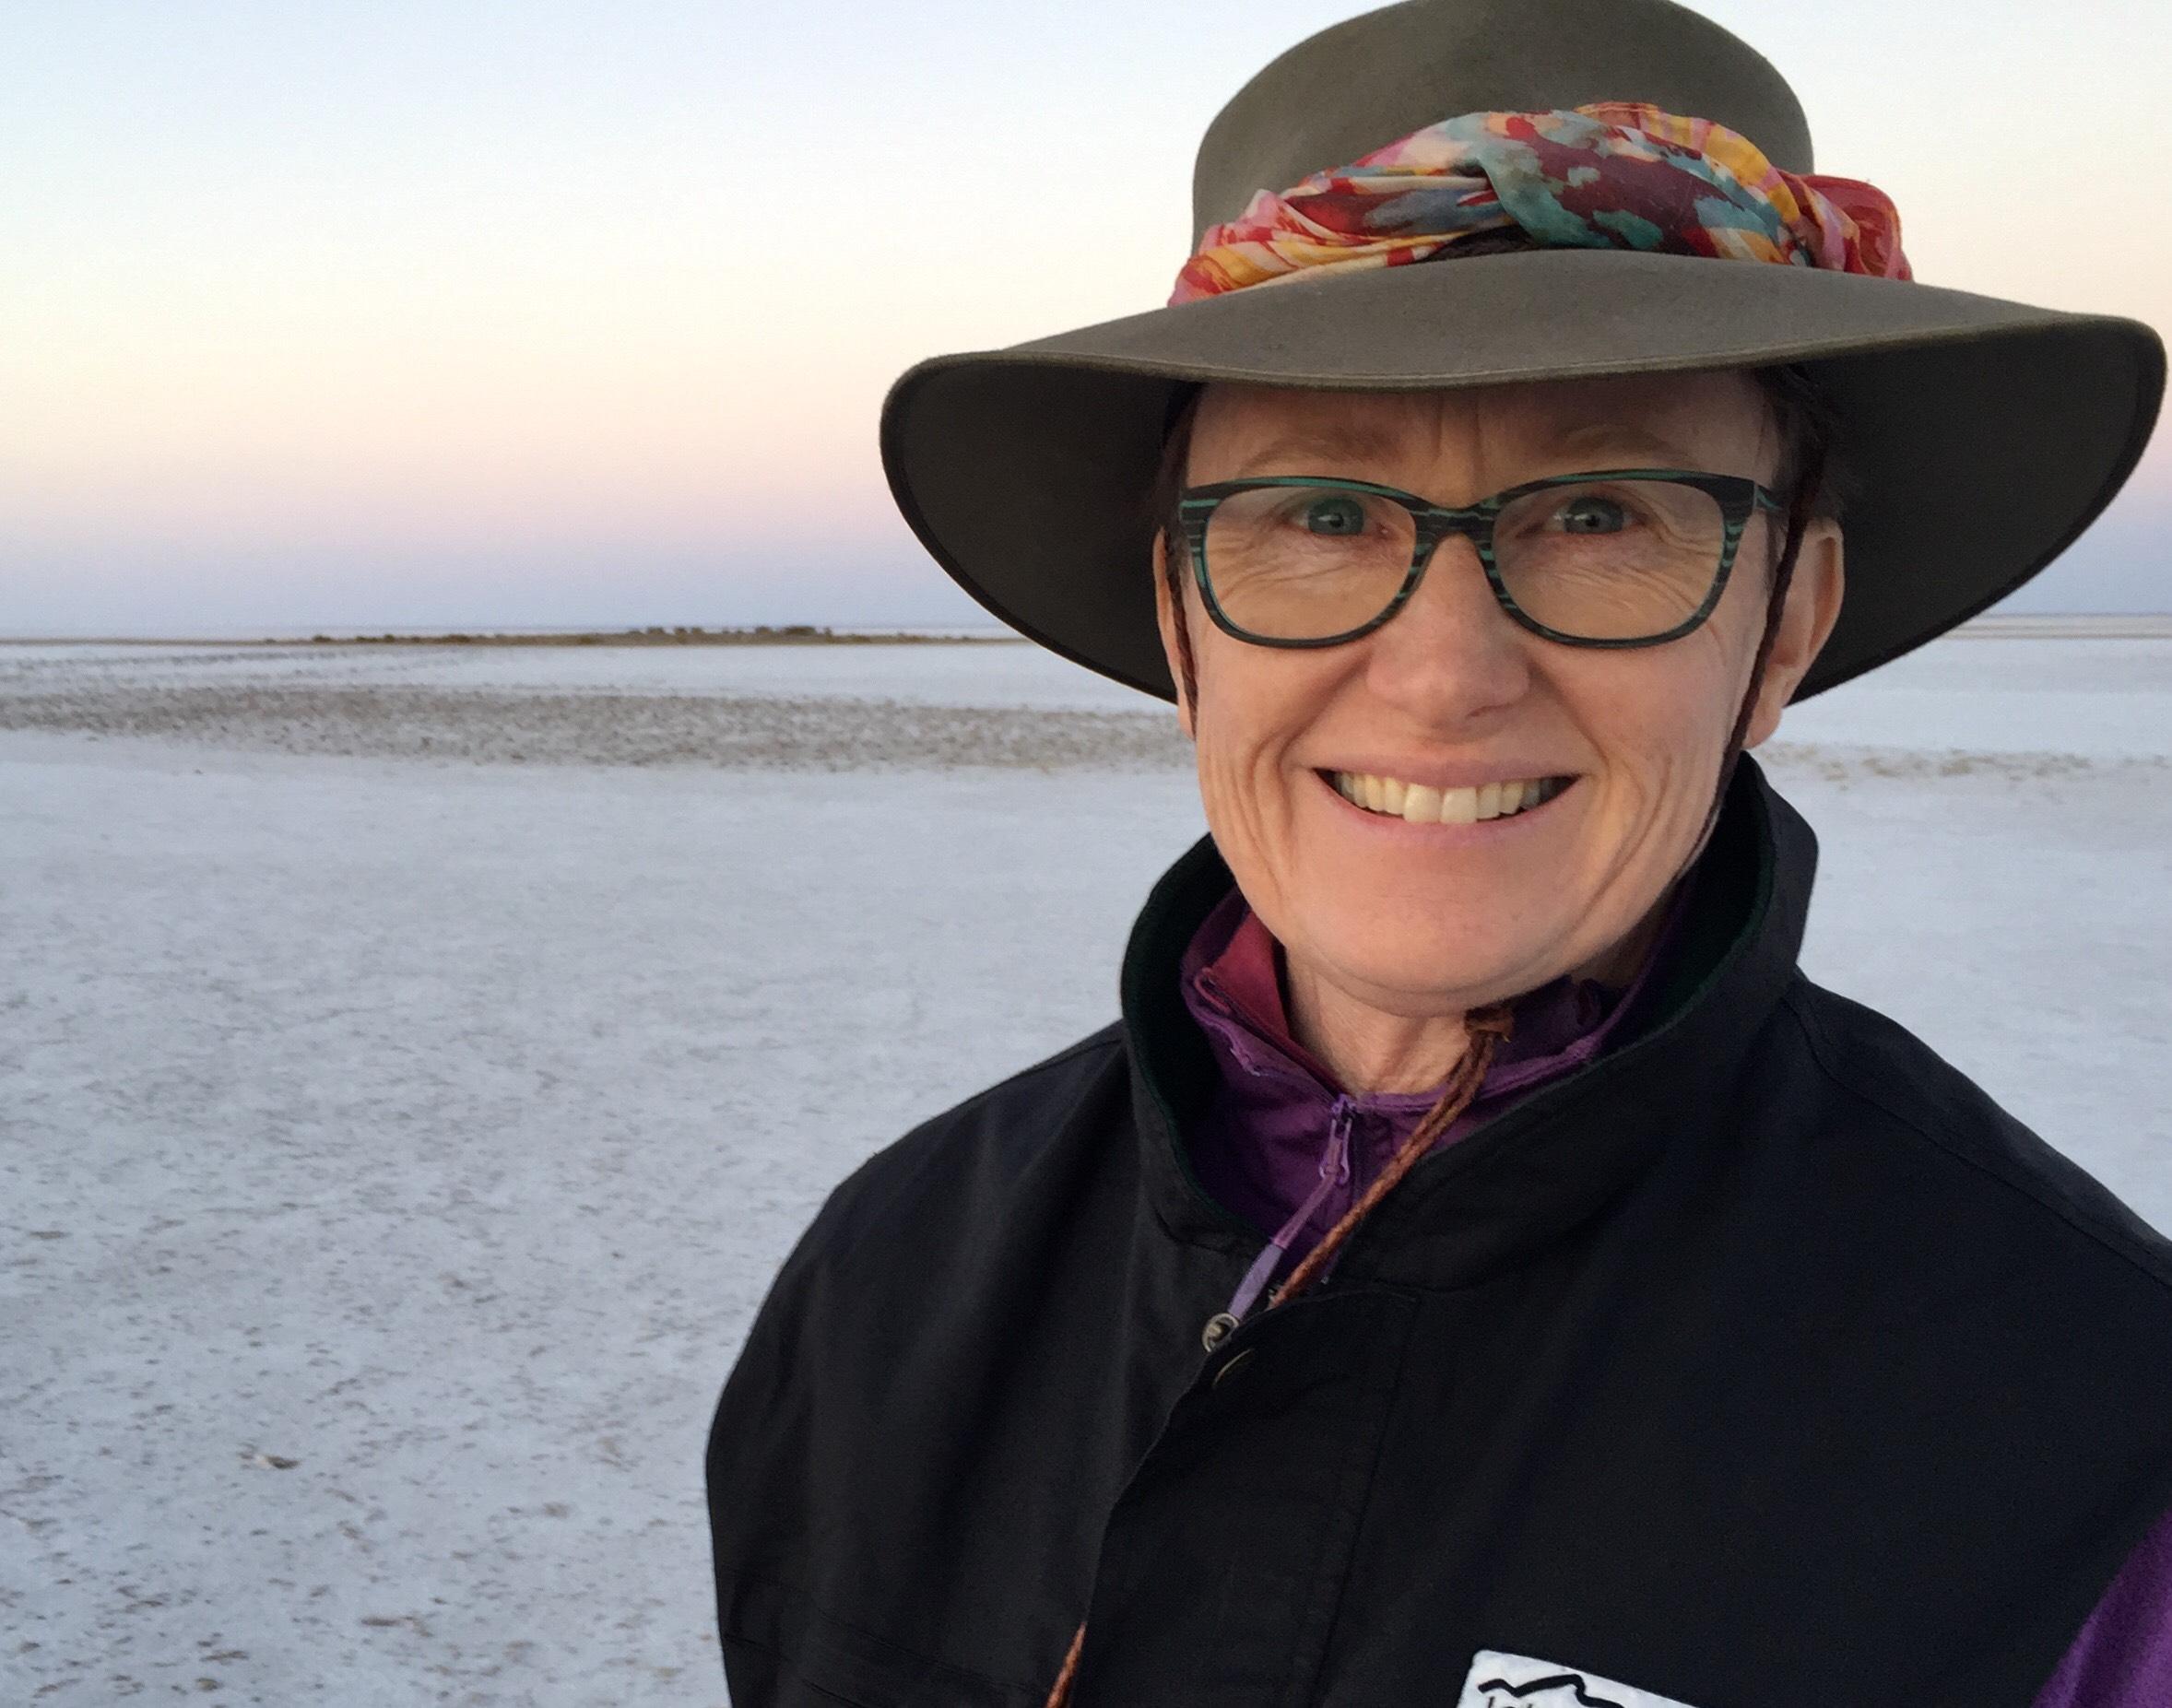 Liza Dale-Hallett at Lake Eyre, 2017, Image Supplied, Liza Dale-Hallett